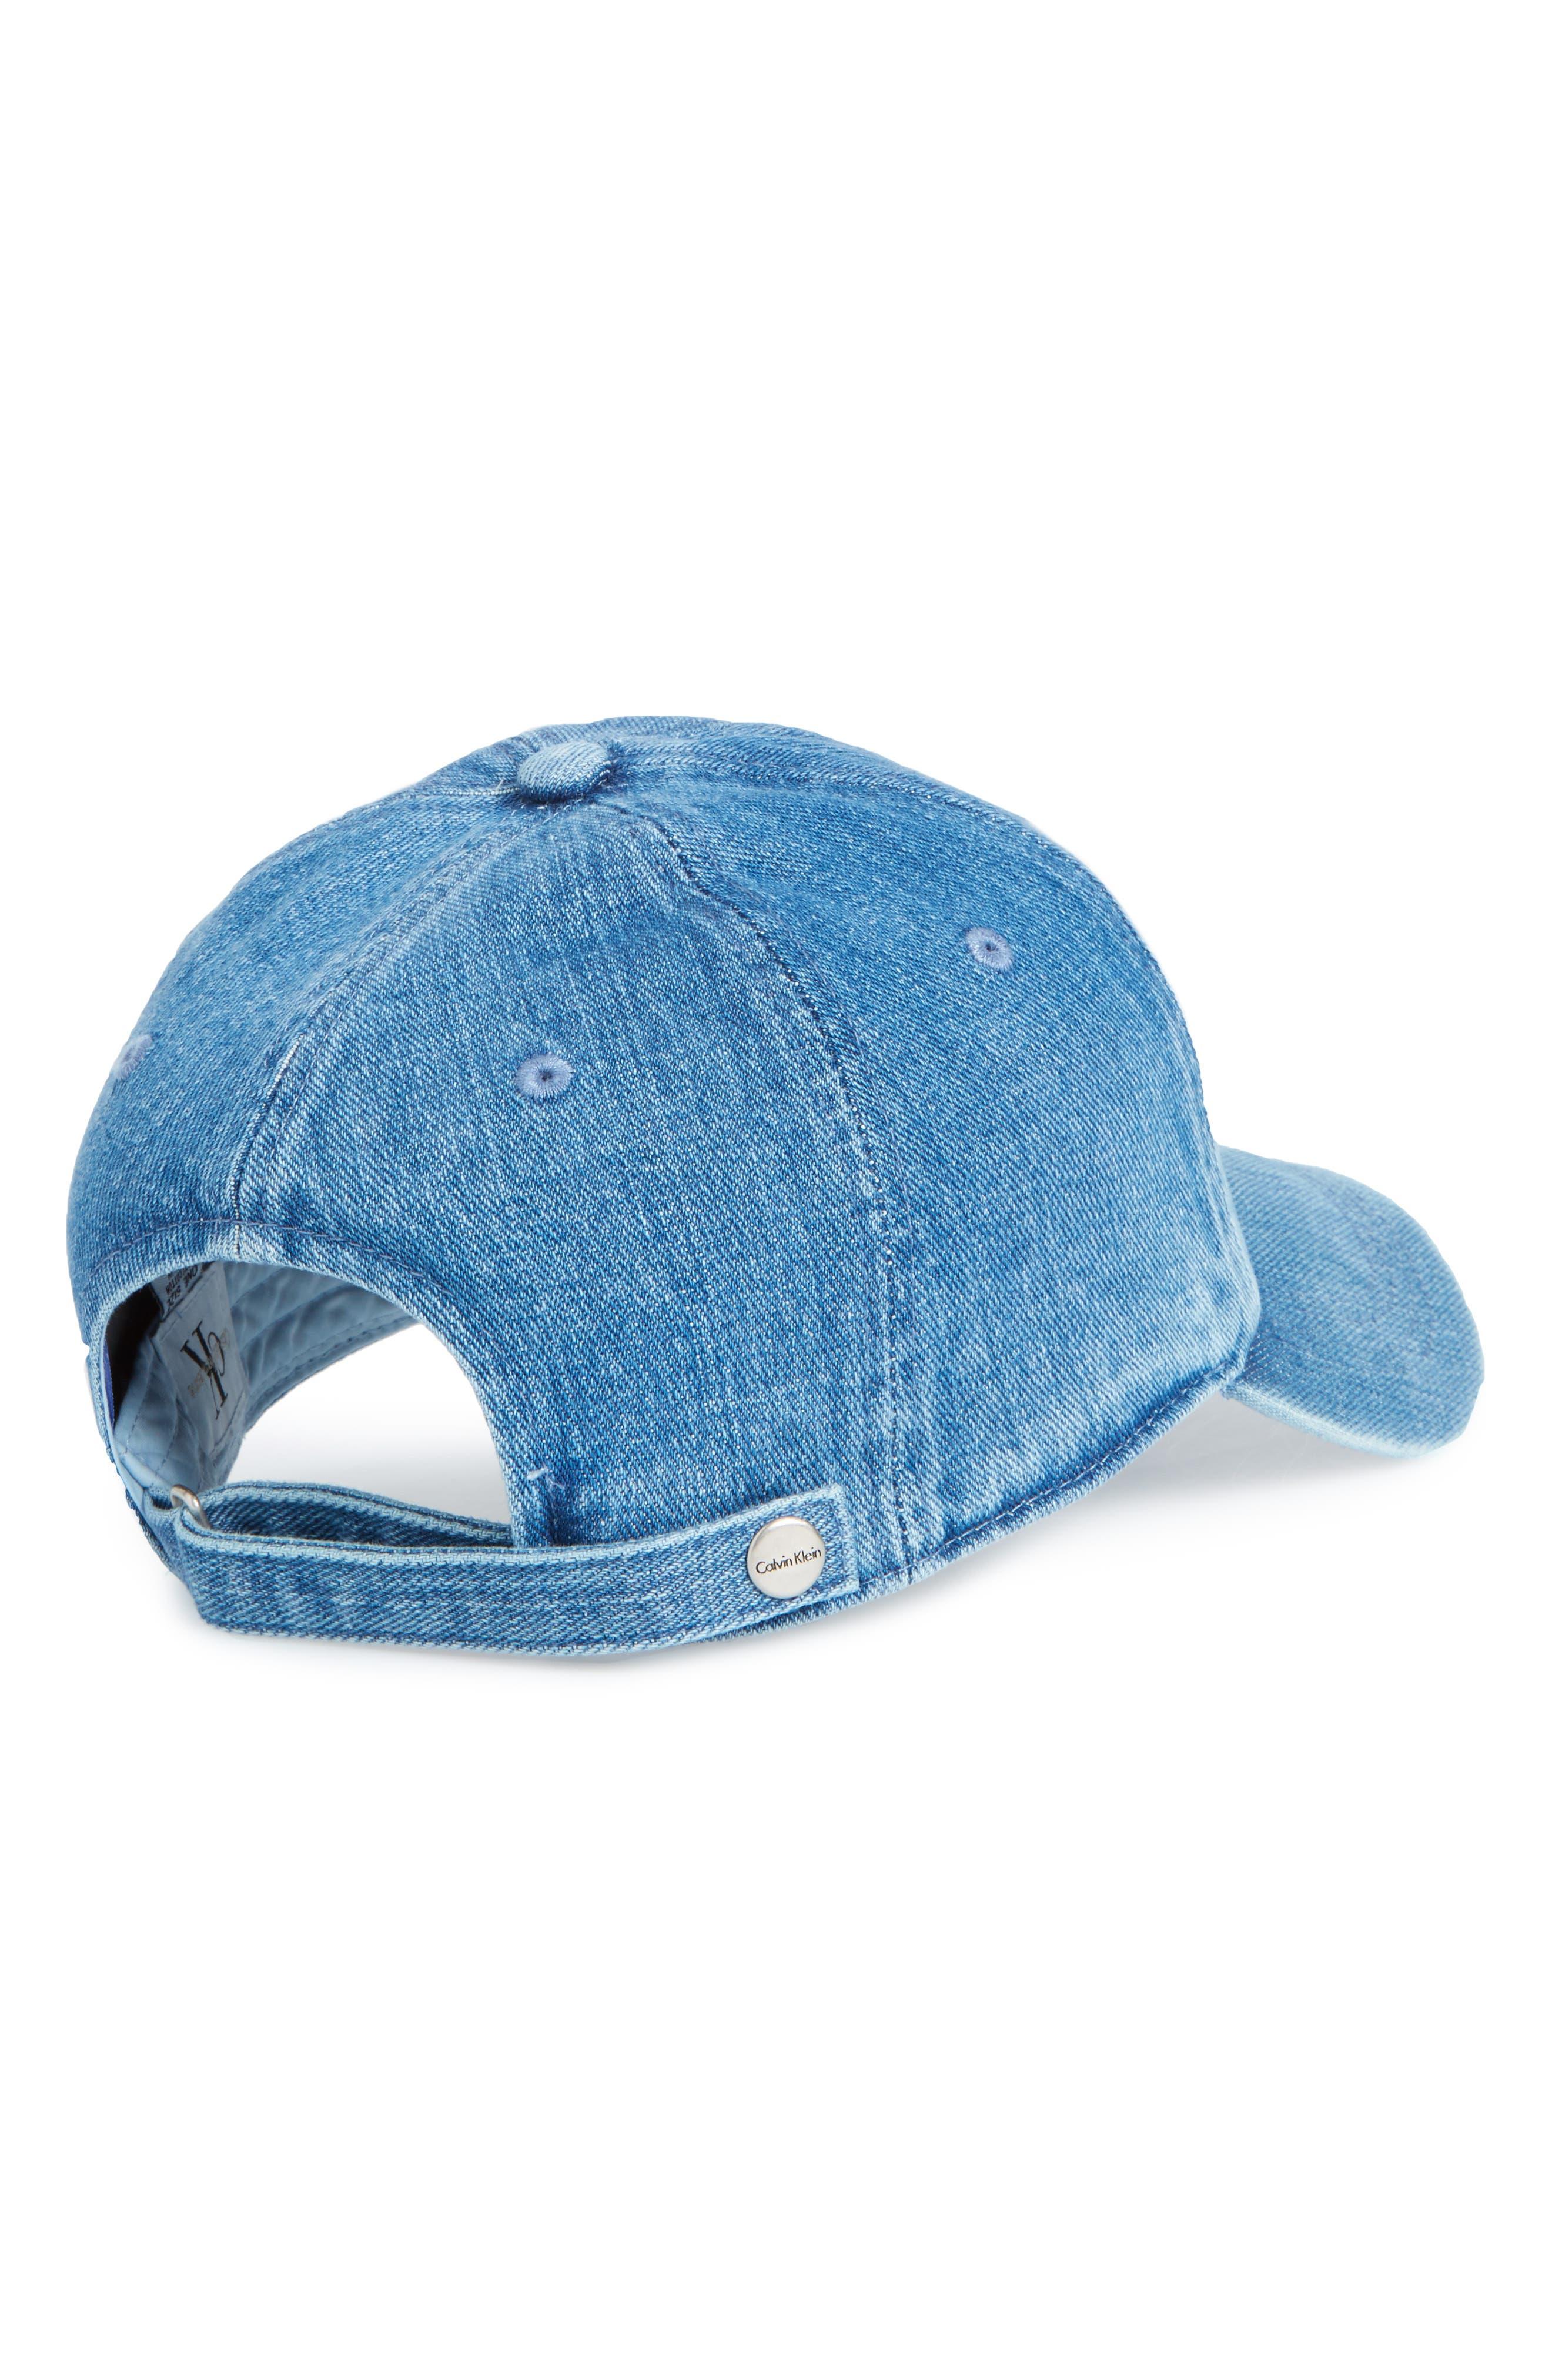 Calvin Klein CK Jeans Ball Cap,                             Alternate thumbnail 2, color,                             Stone Wash